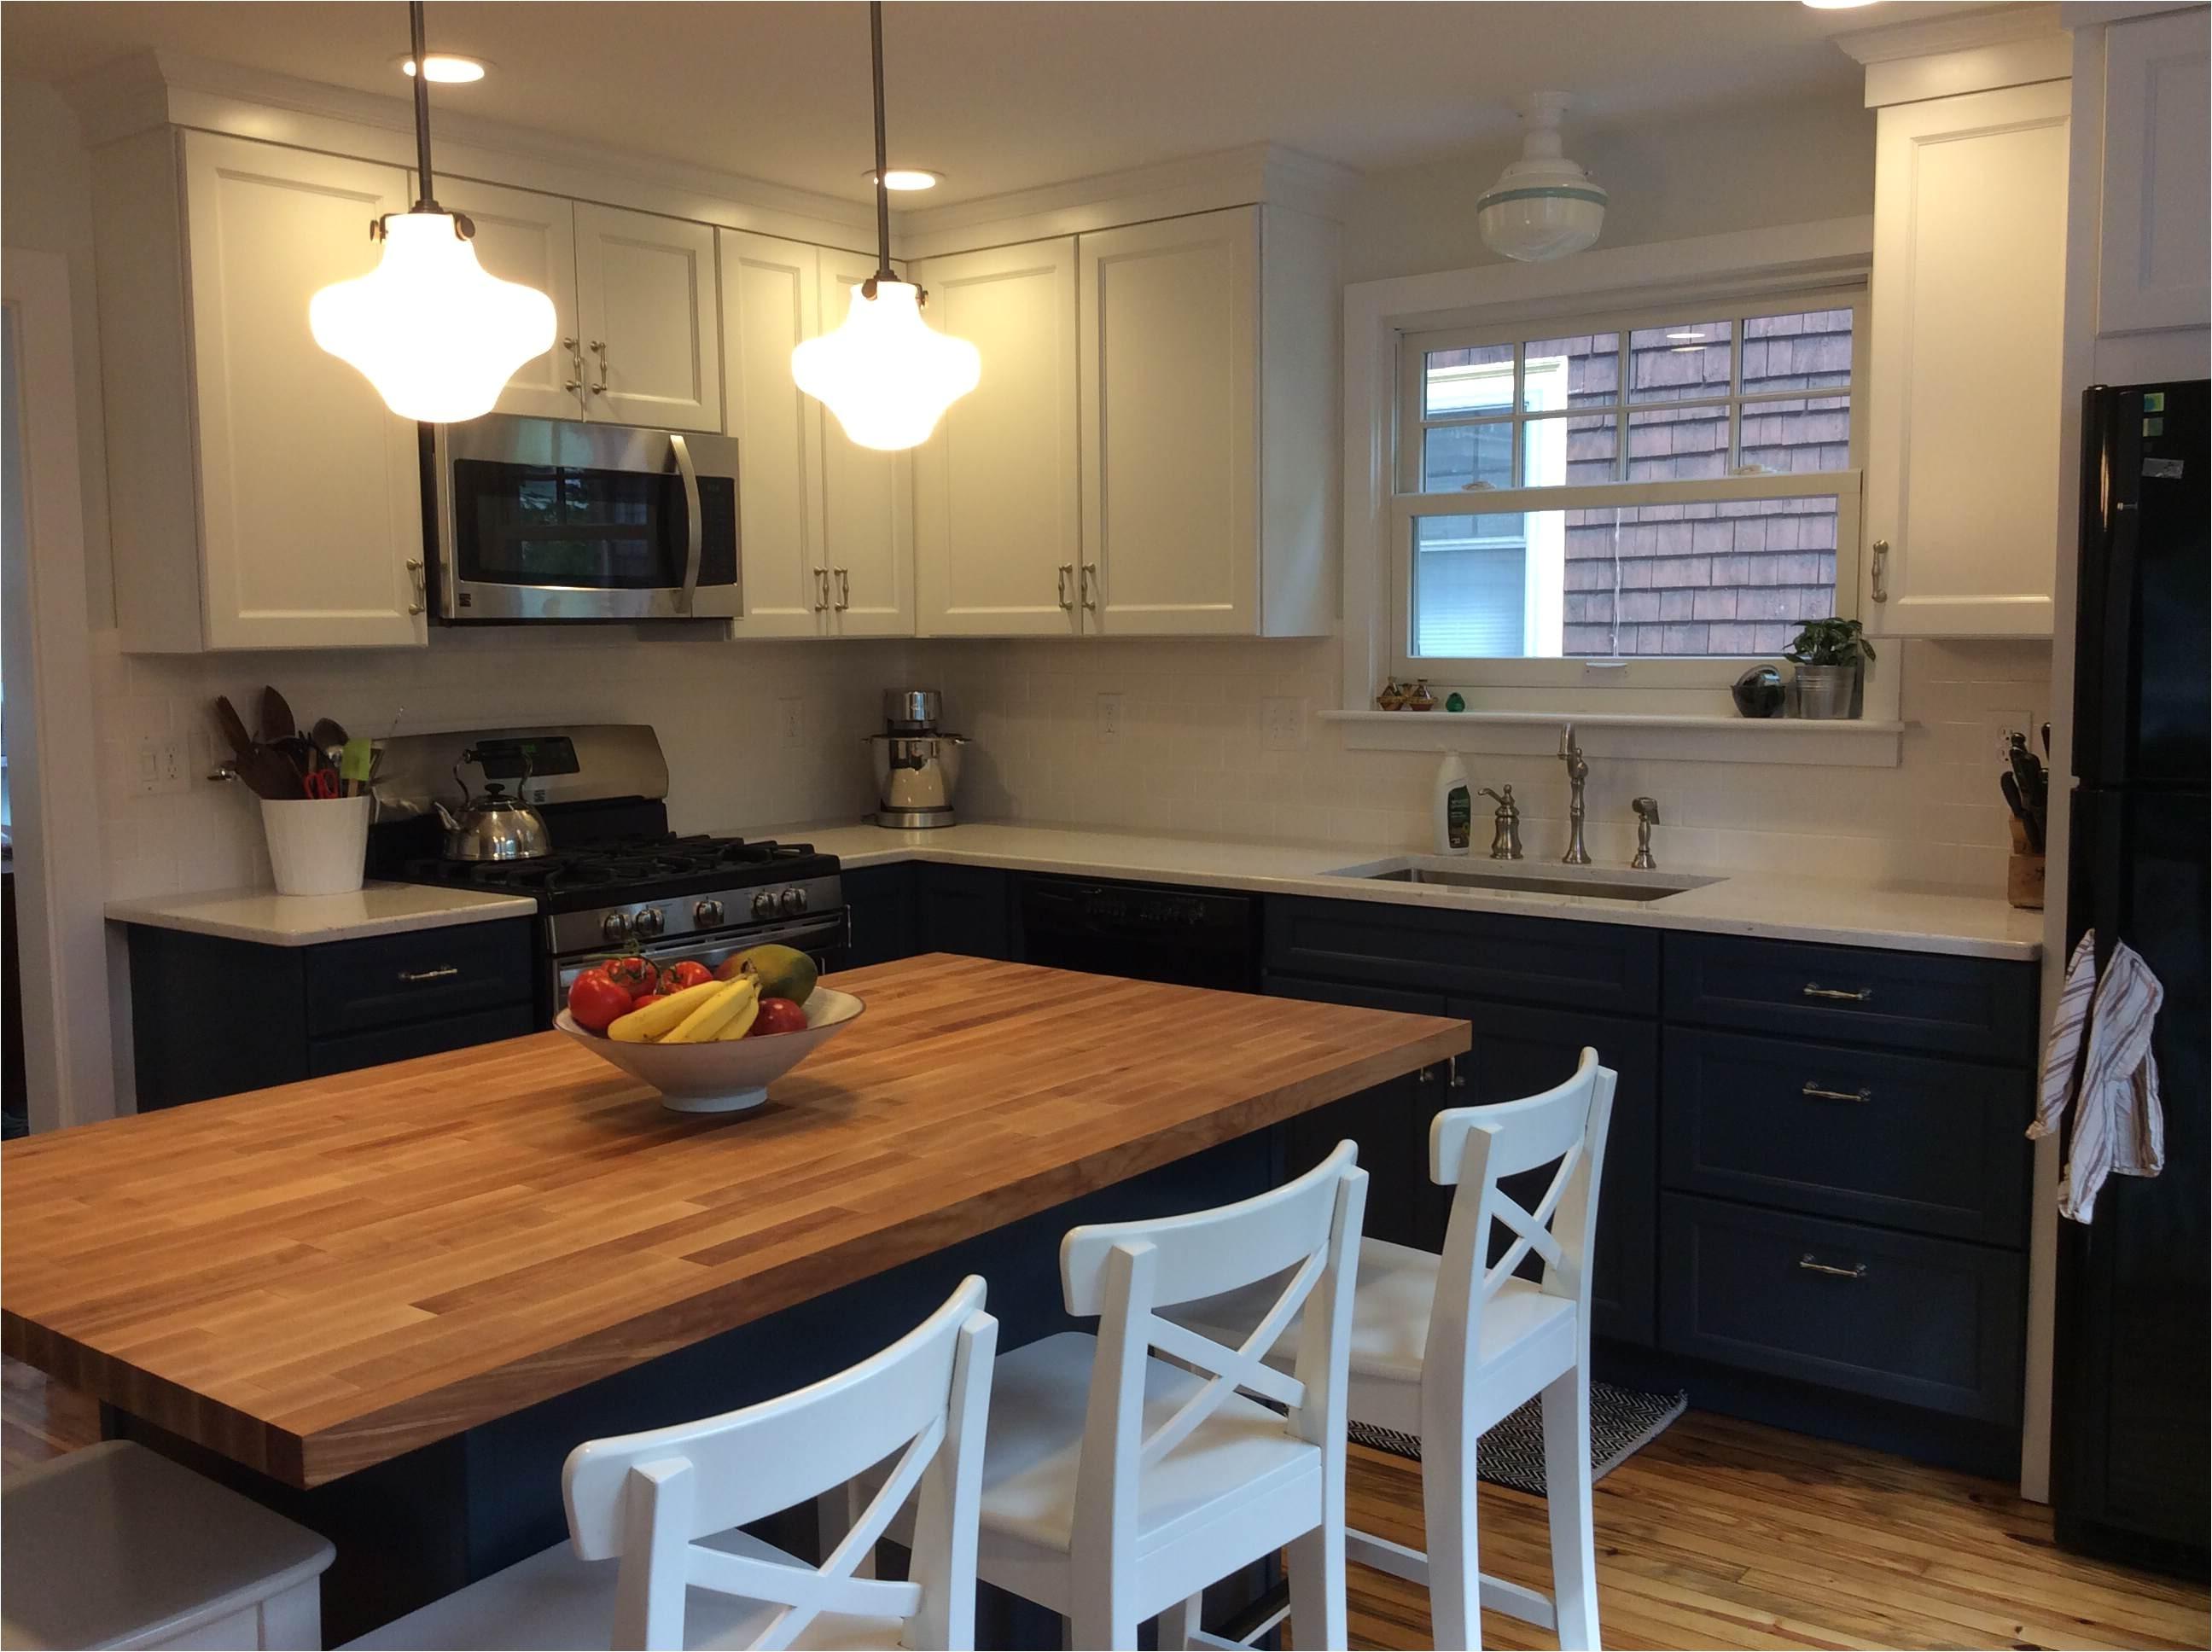 li cabinets reviews elegant beautiful kitchen cabinets design ri rh bradshomefurnishings com kitchen cabinets in reno kitchen cabinets in arizona